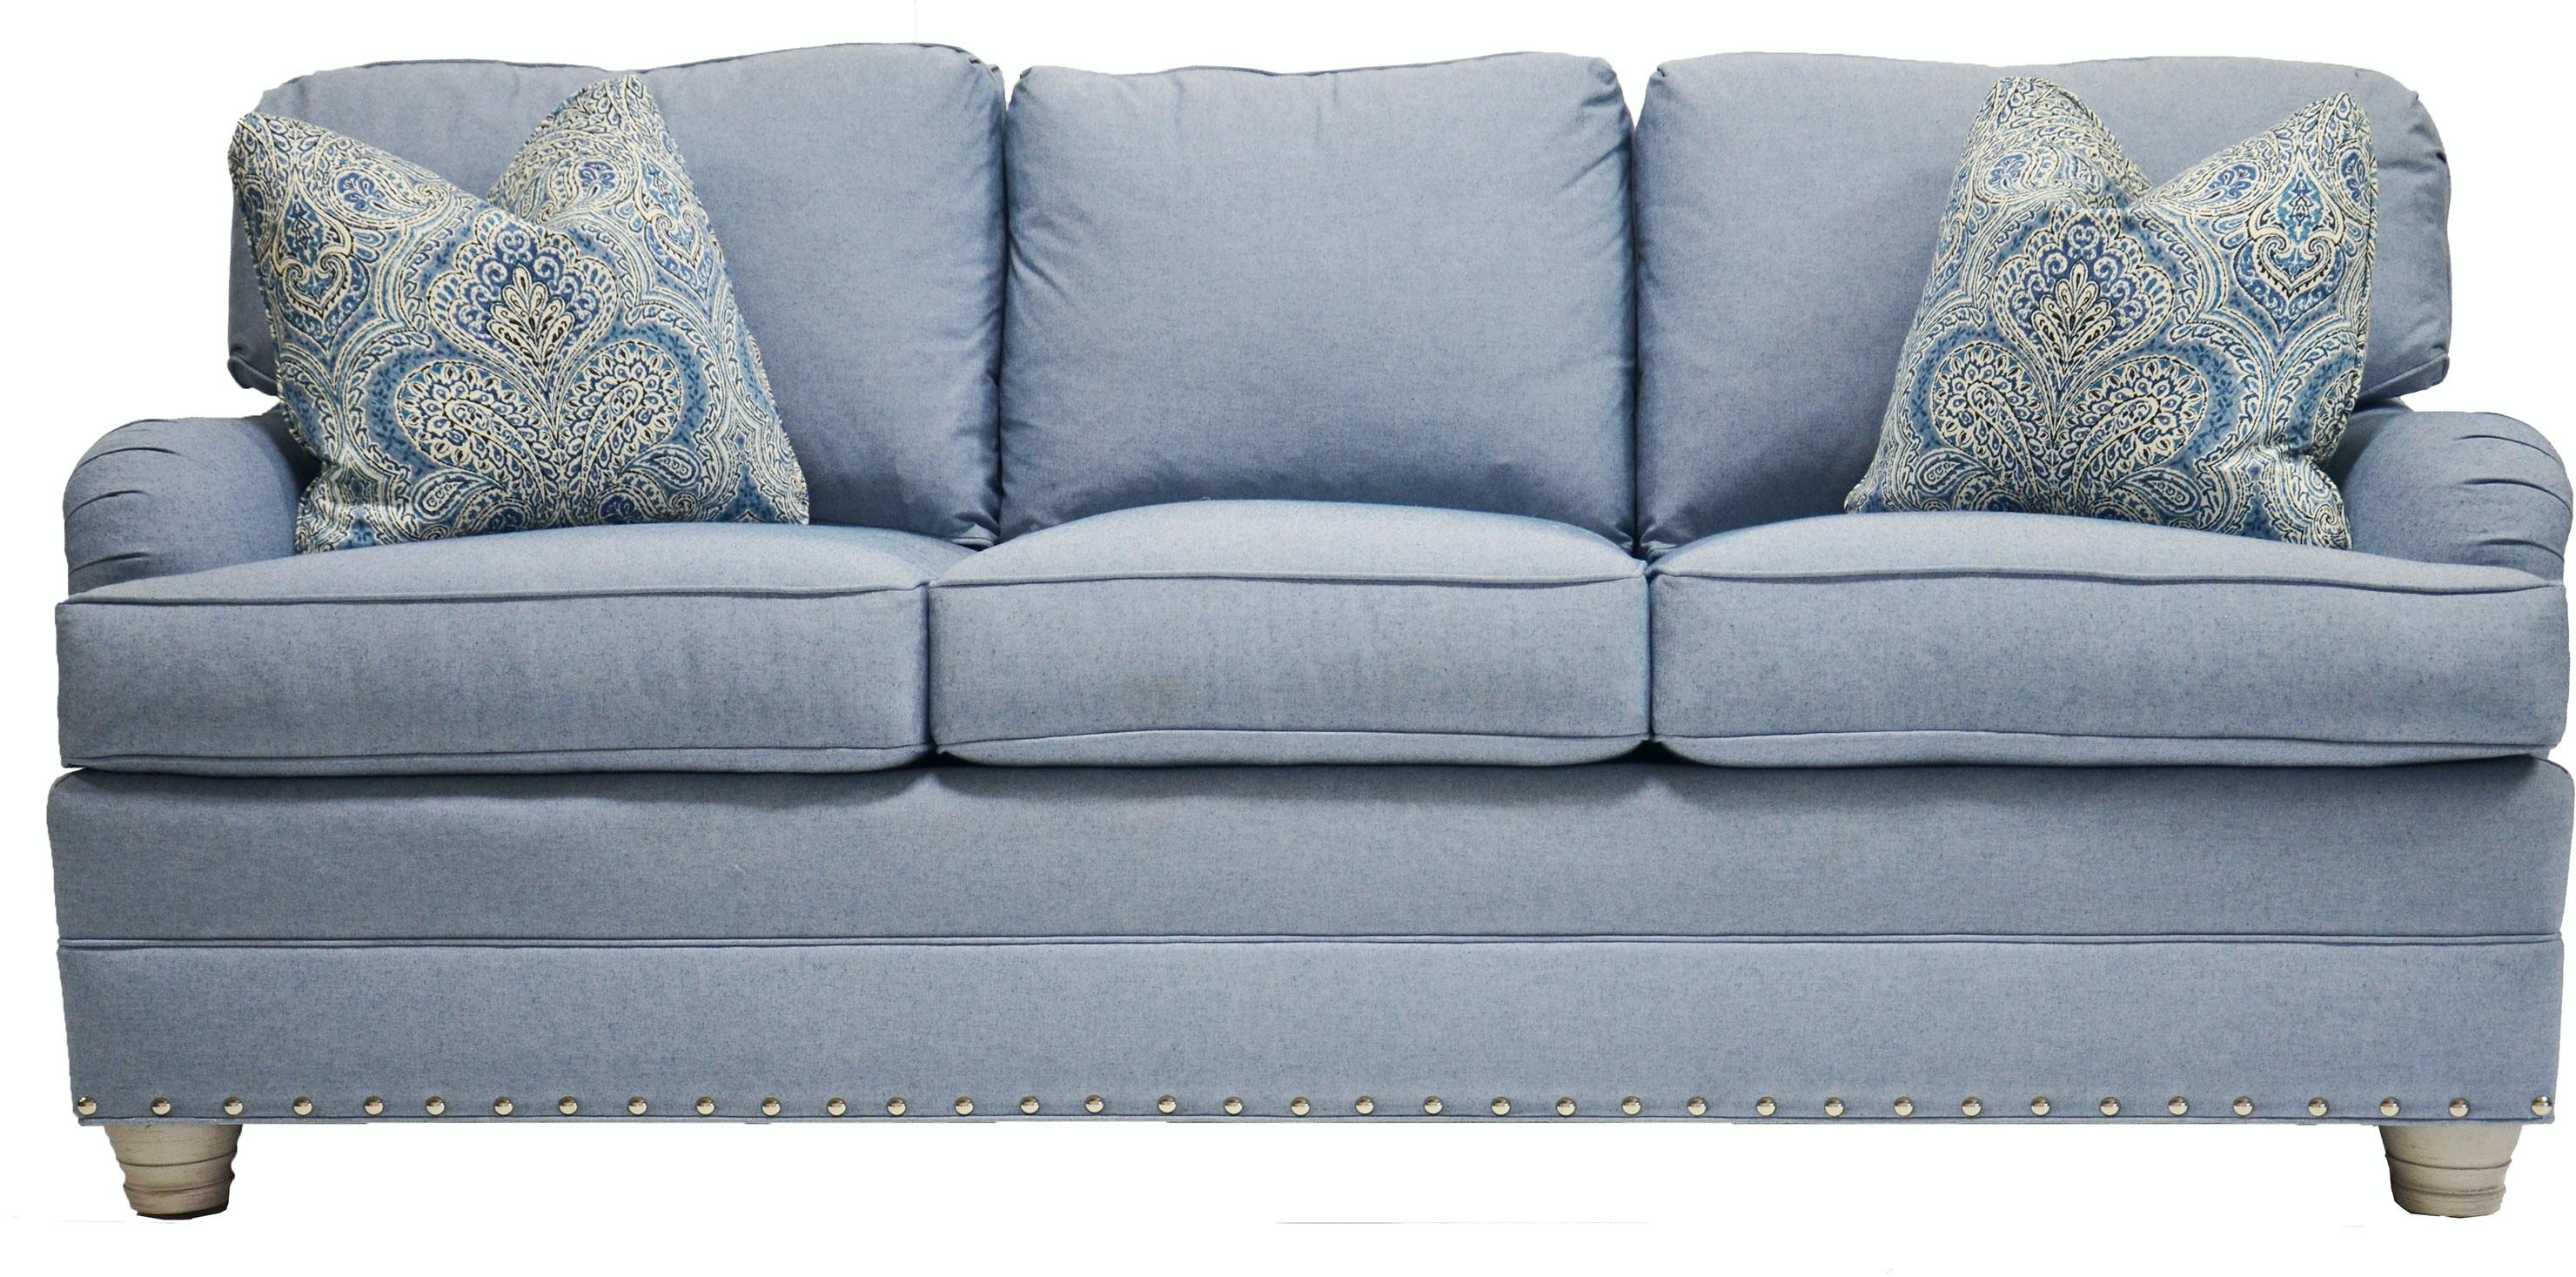 Vanguard Living Room East Lake Sleep Sofa 603 SS Whitley